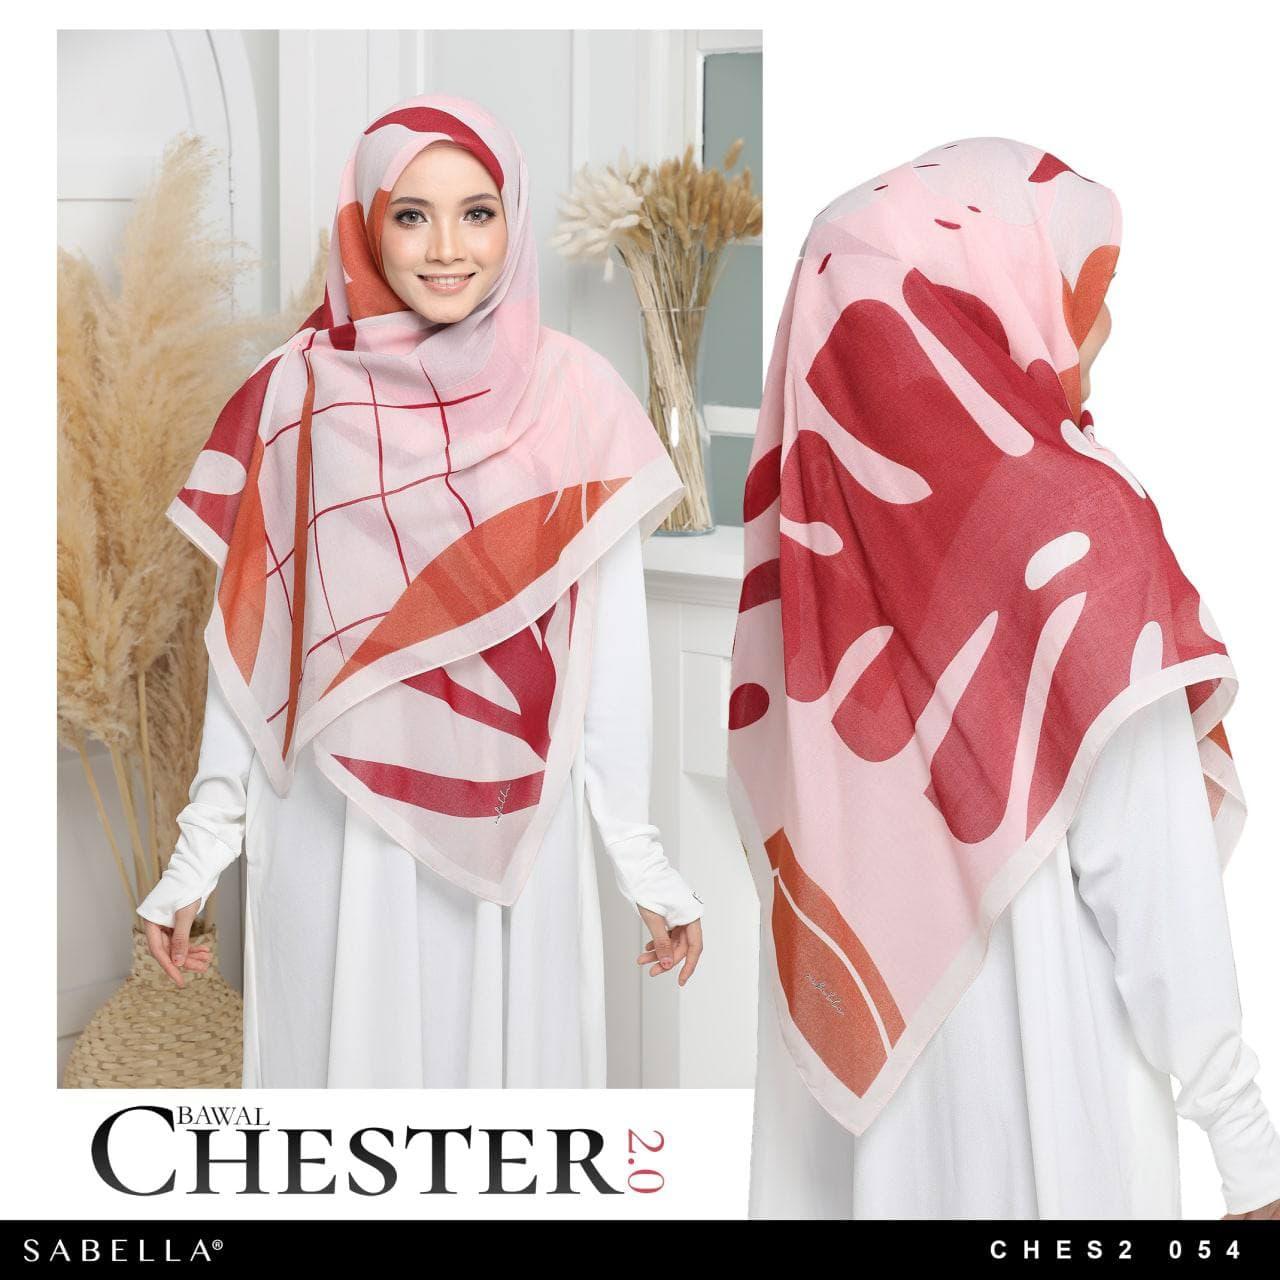 Bawal Chester (50) 054